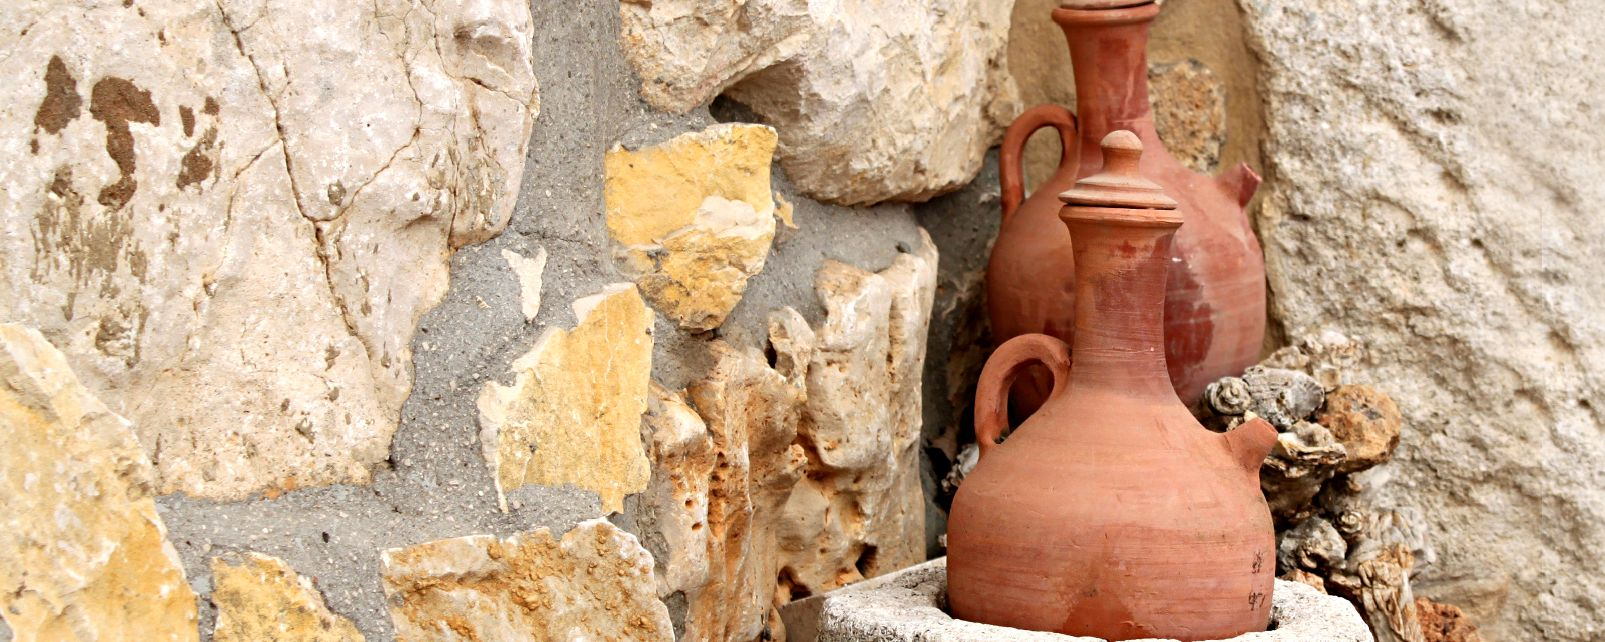 L'artisanat local , Liban